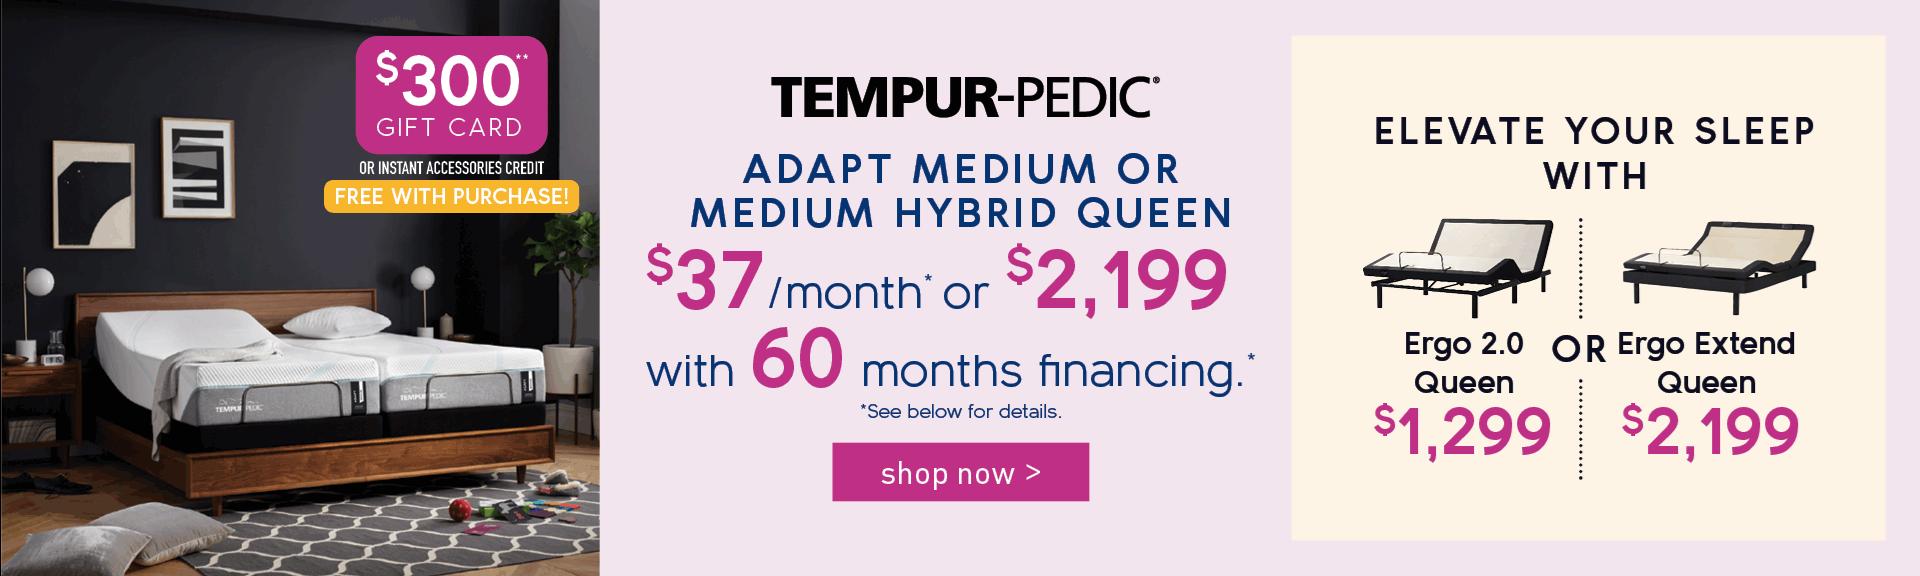 Tempur-Pedic Promo